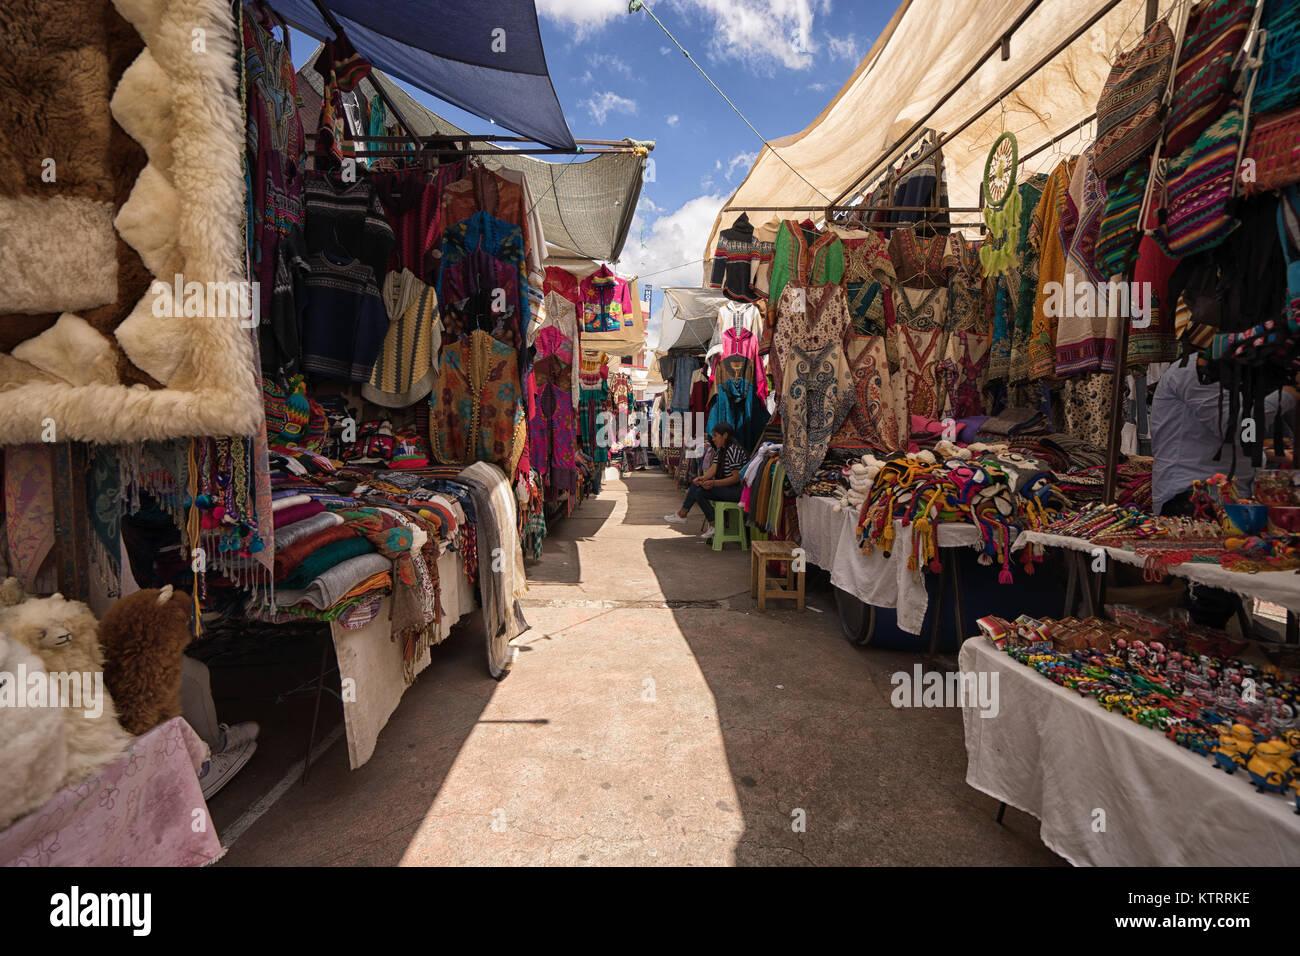 Otavalo, Ecuador-December 23, 2017: closeup of an indigenous mask for sale in the artisan market - Stock Image